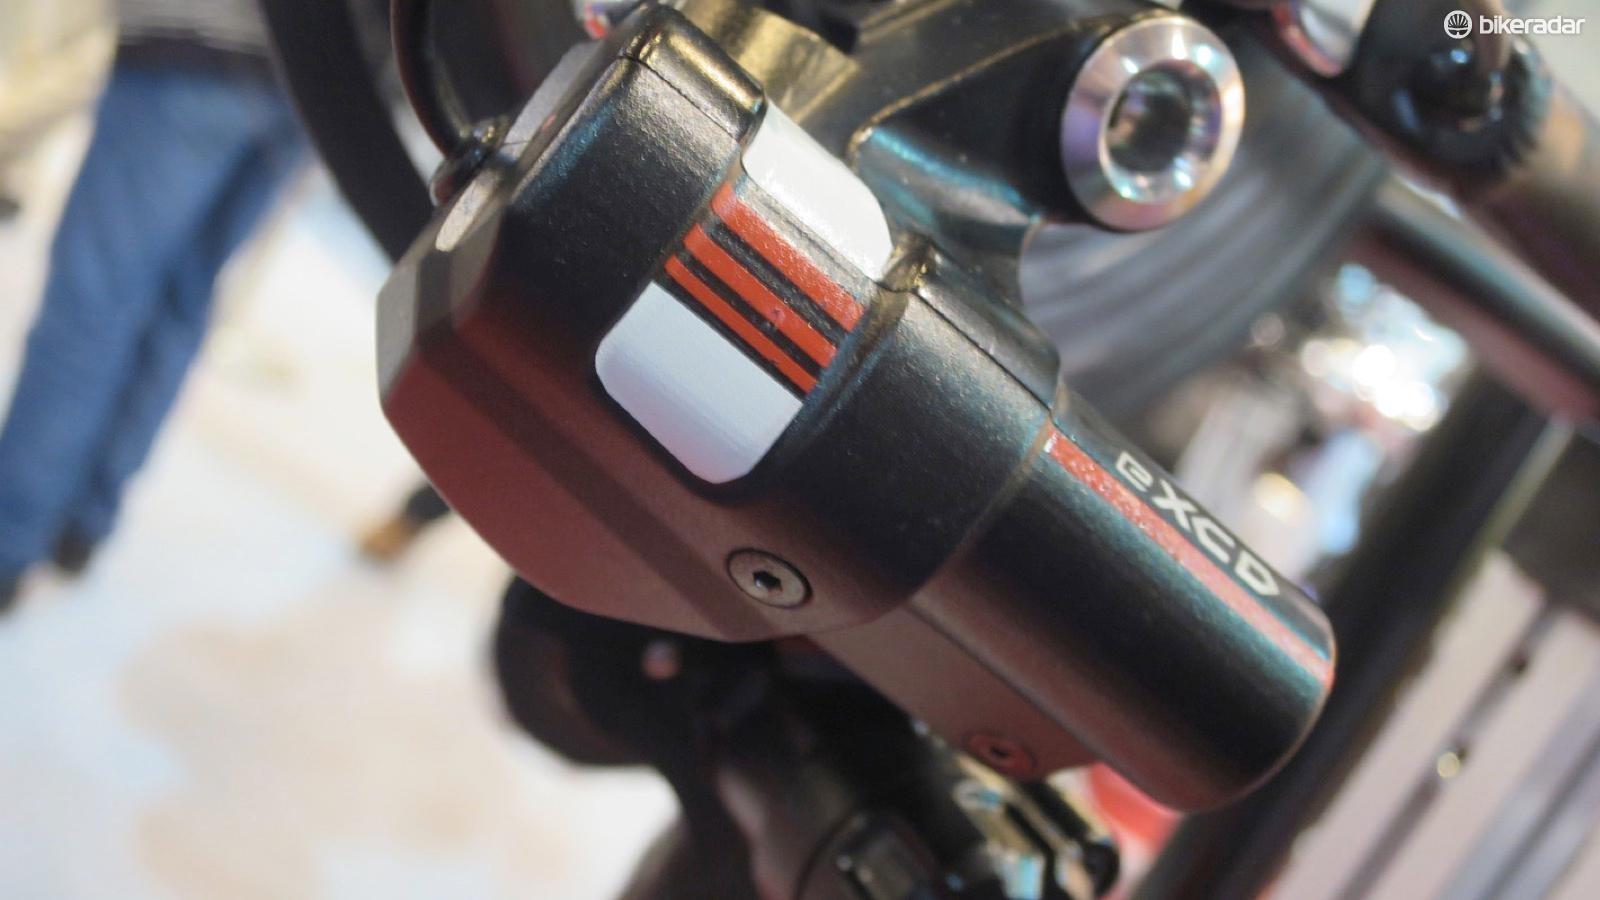 A closer look at Microshift's eXCD rear derailleur